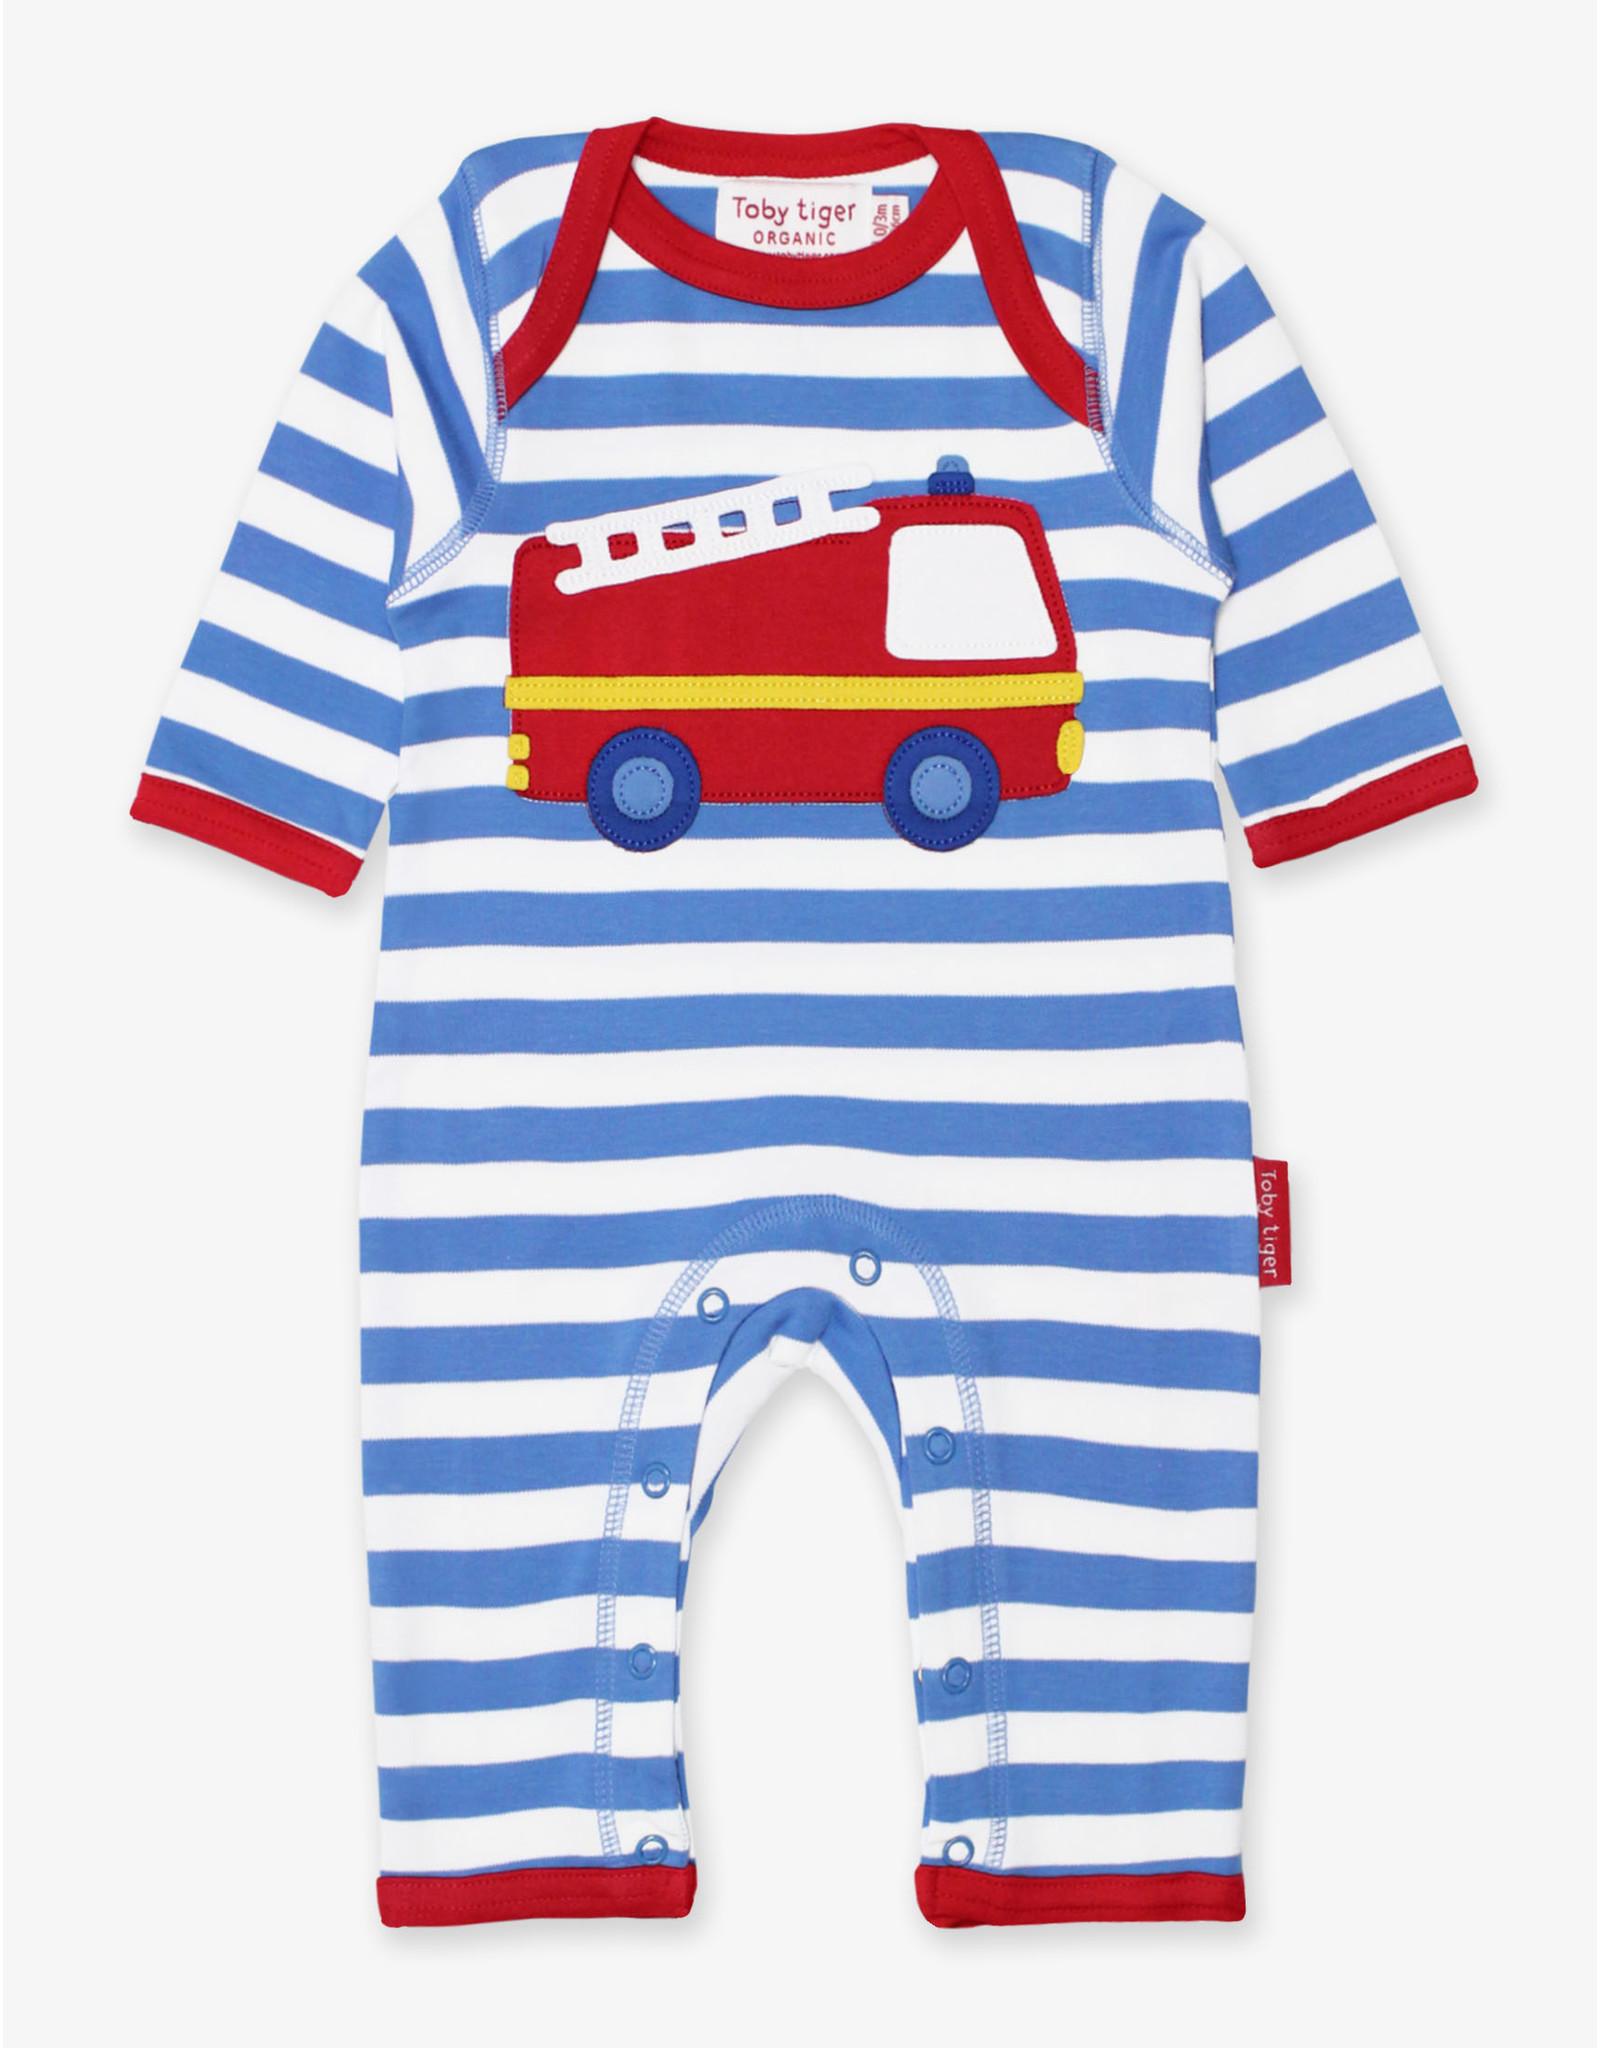 Toby Tiger Baby boxpakje - brandweerauto